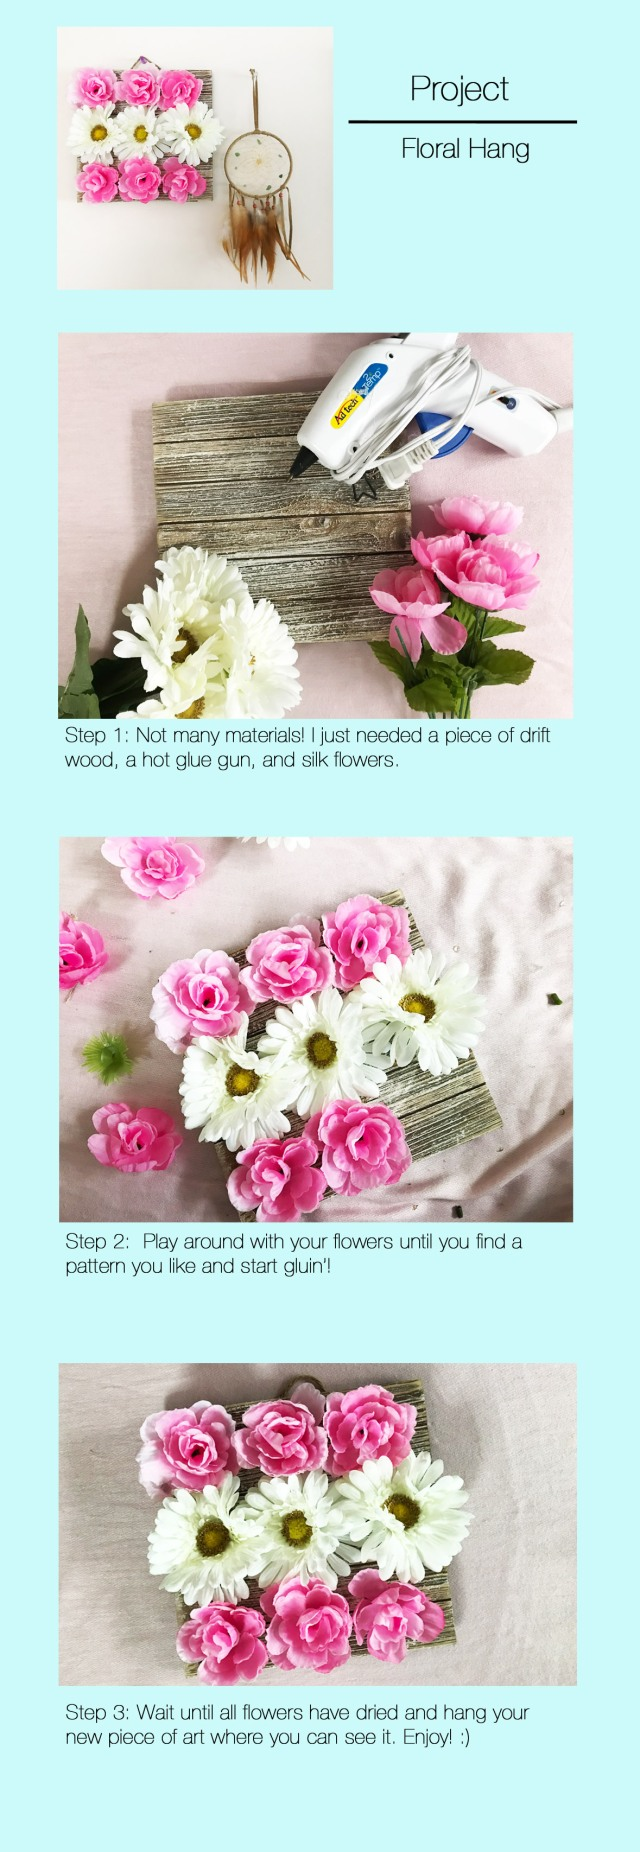 floral hang